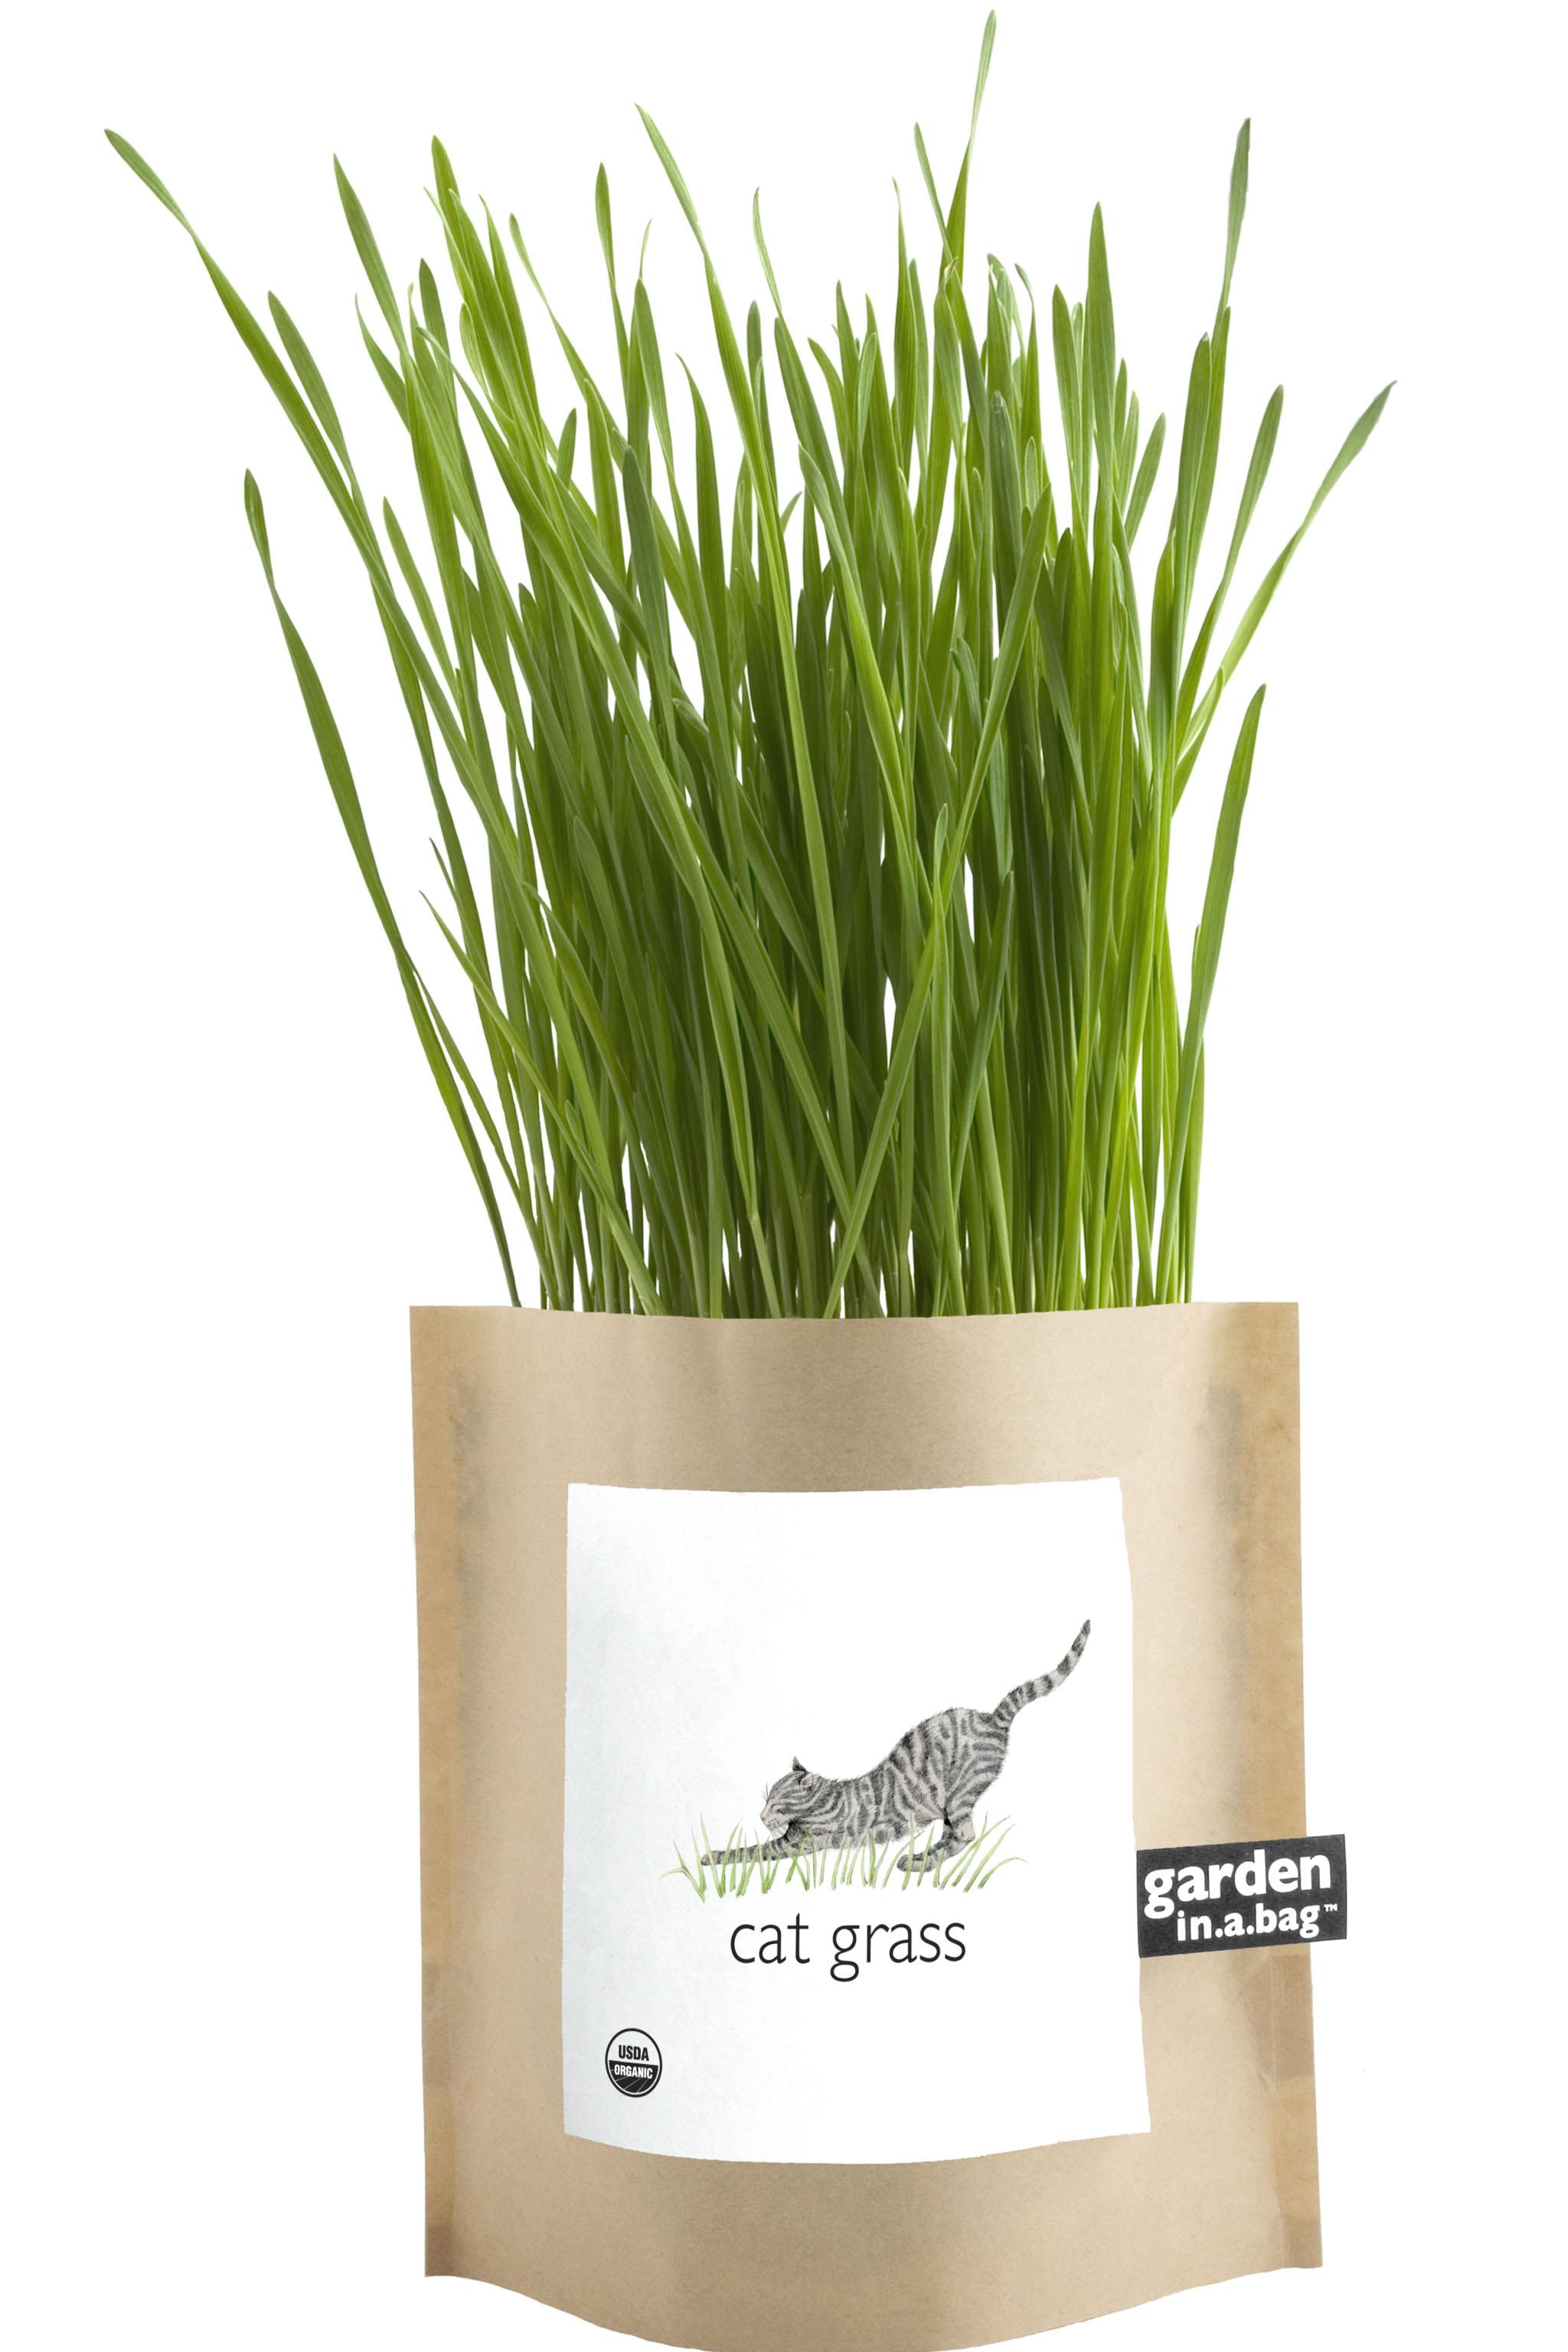 GIB Gr Cat Grass.jpg